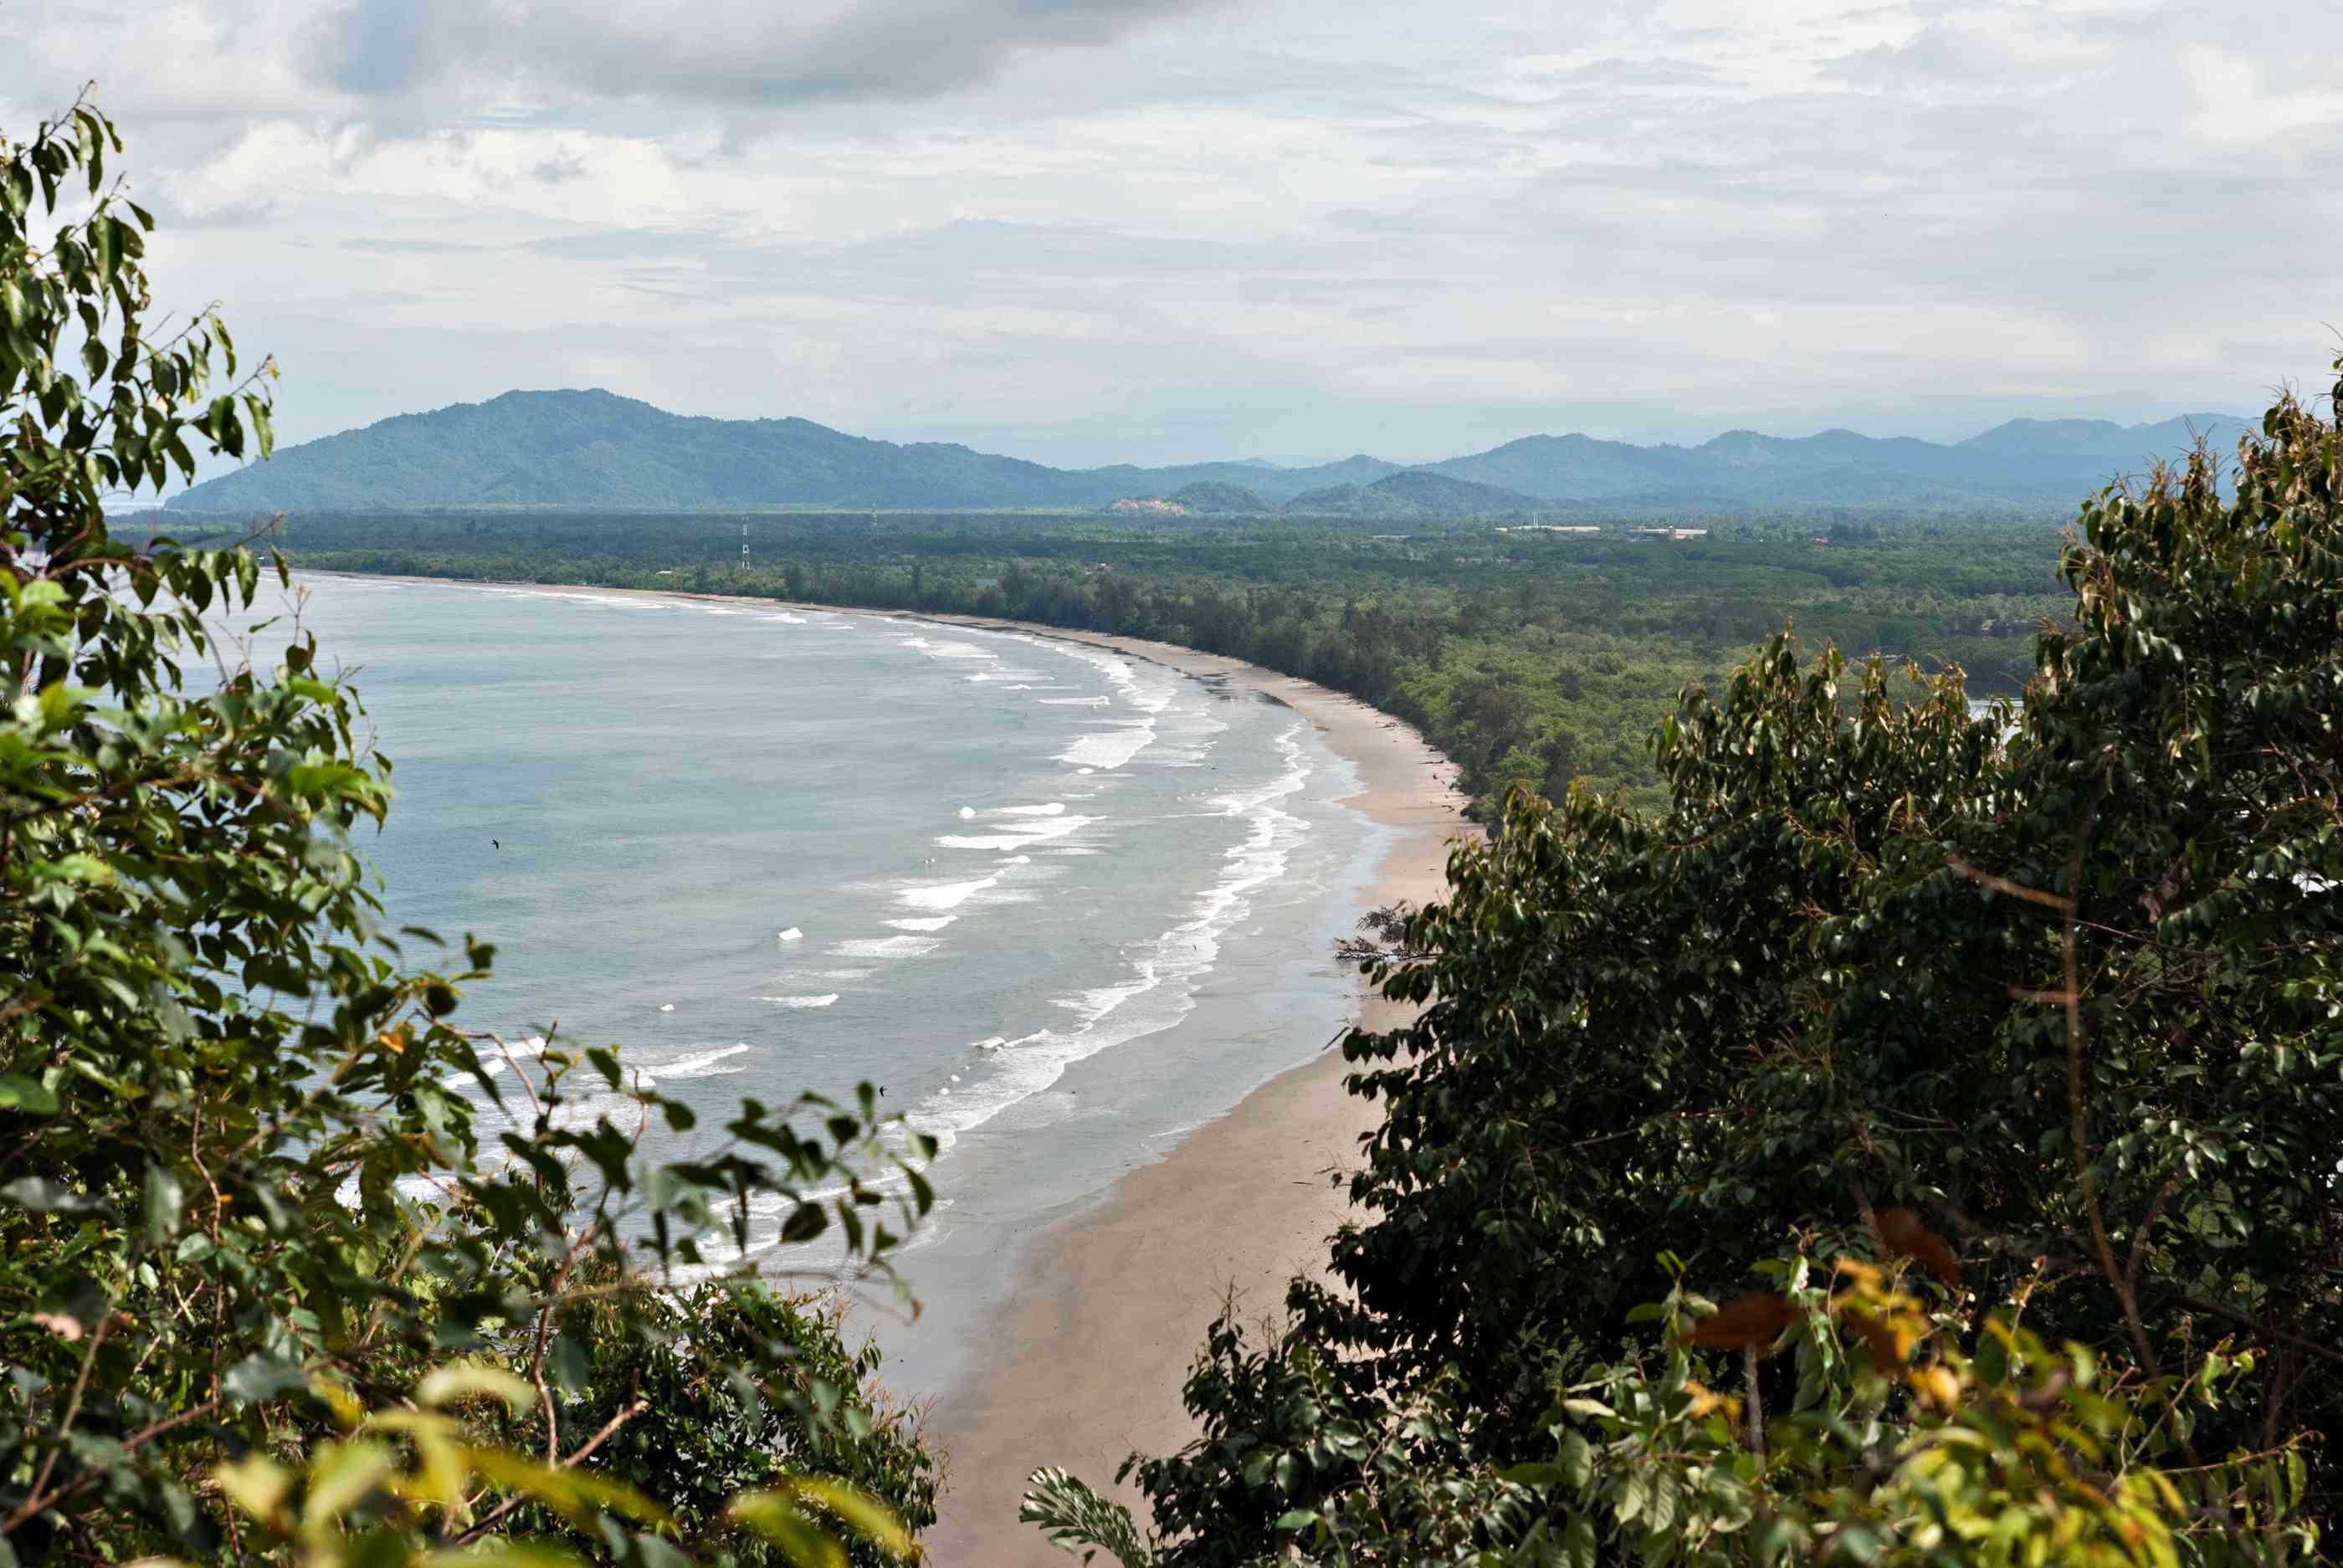 Beach at Pantai Dalit as seen from the Rasa Ria